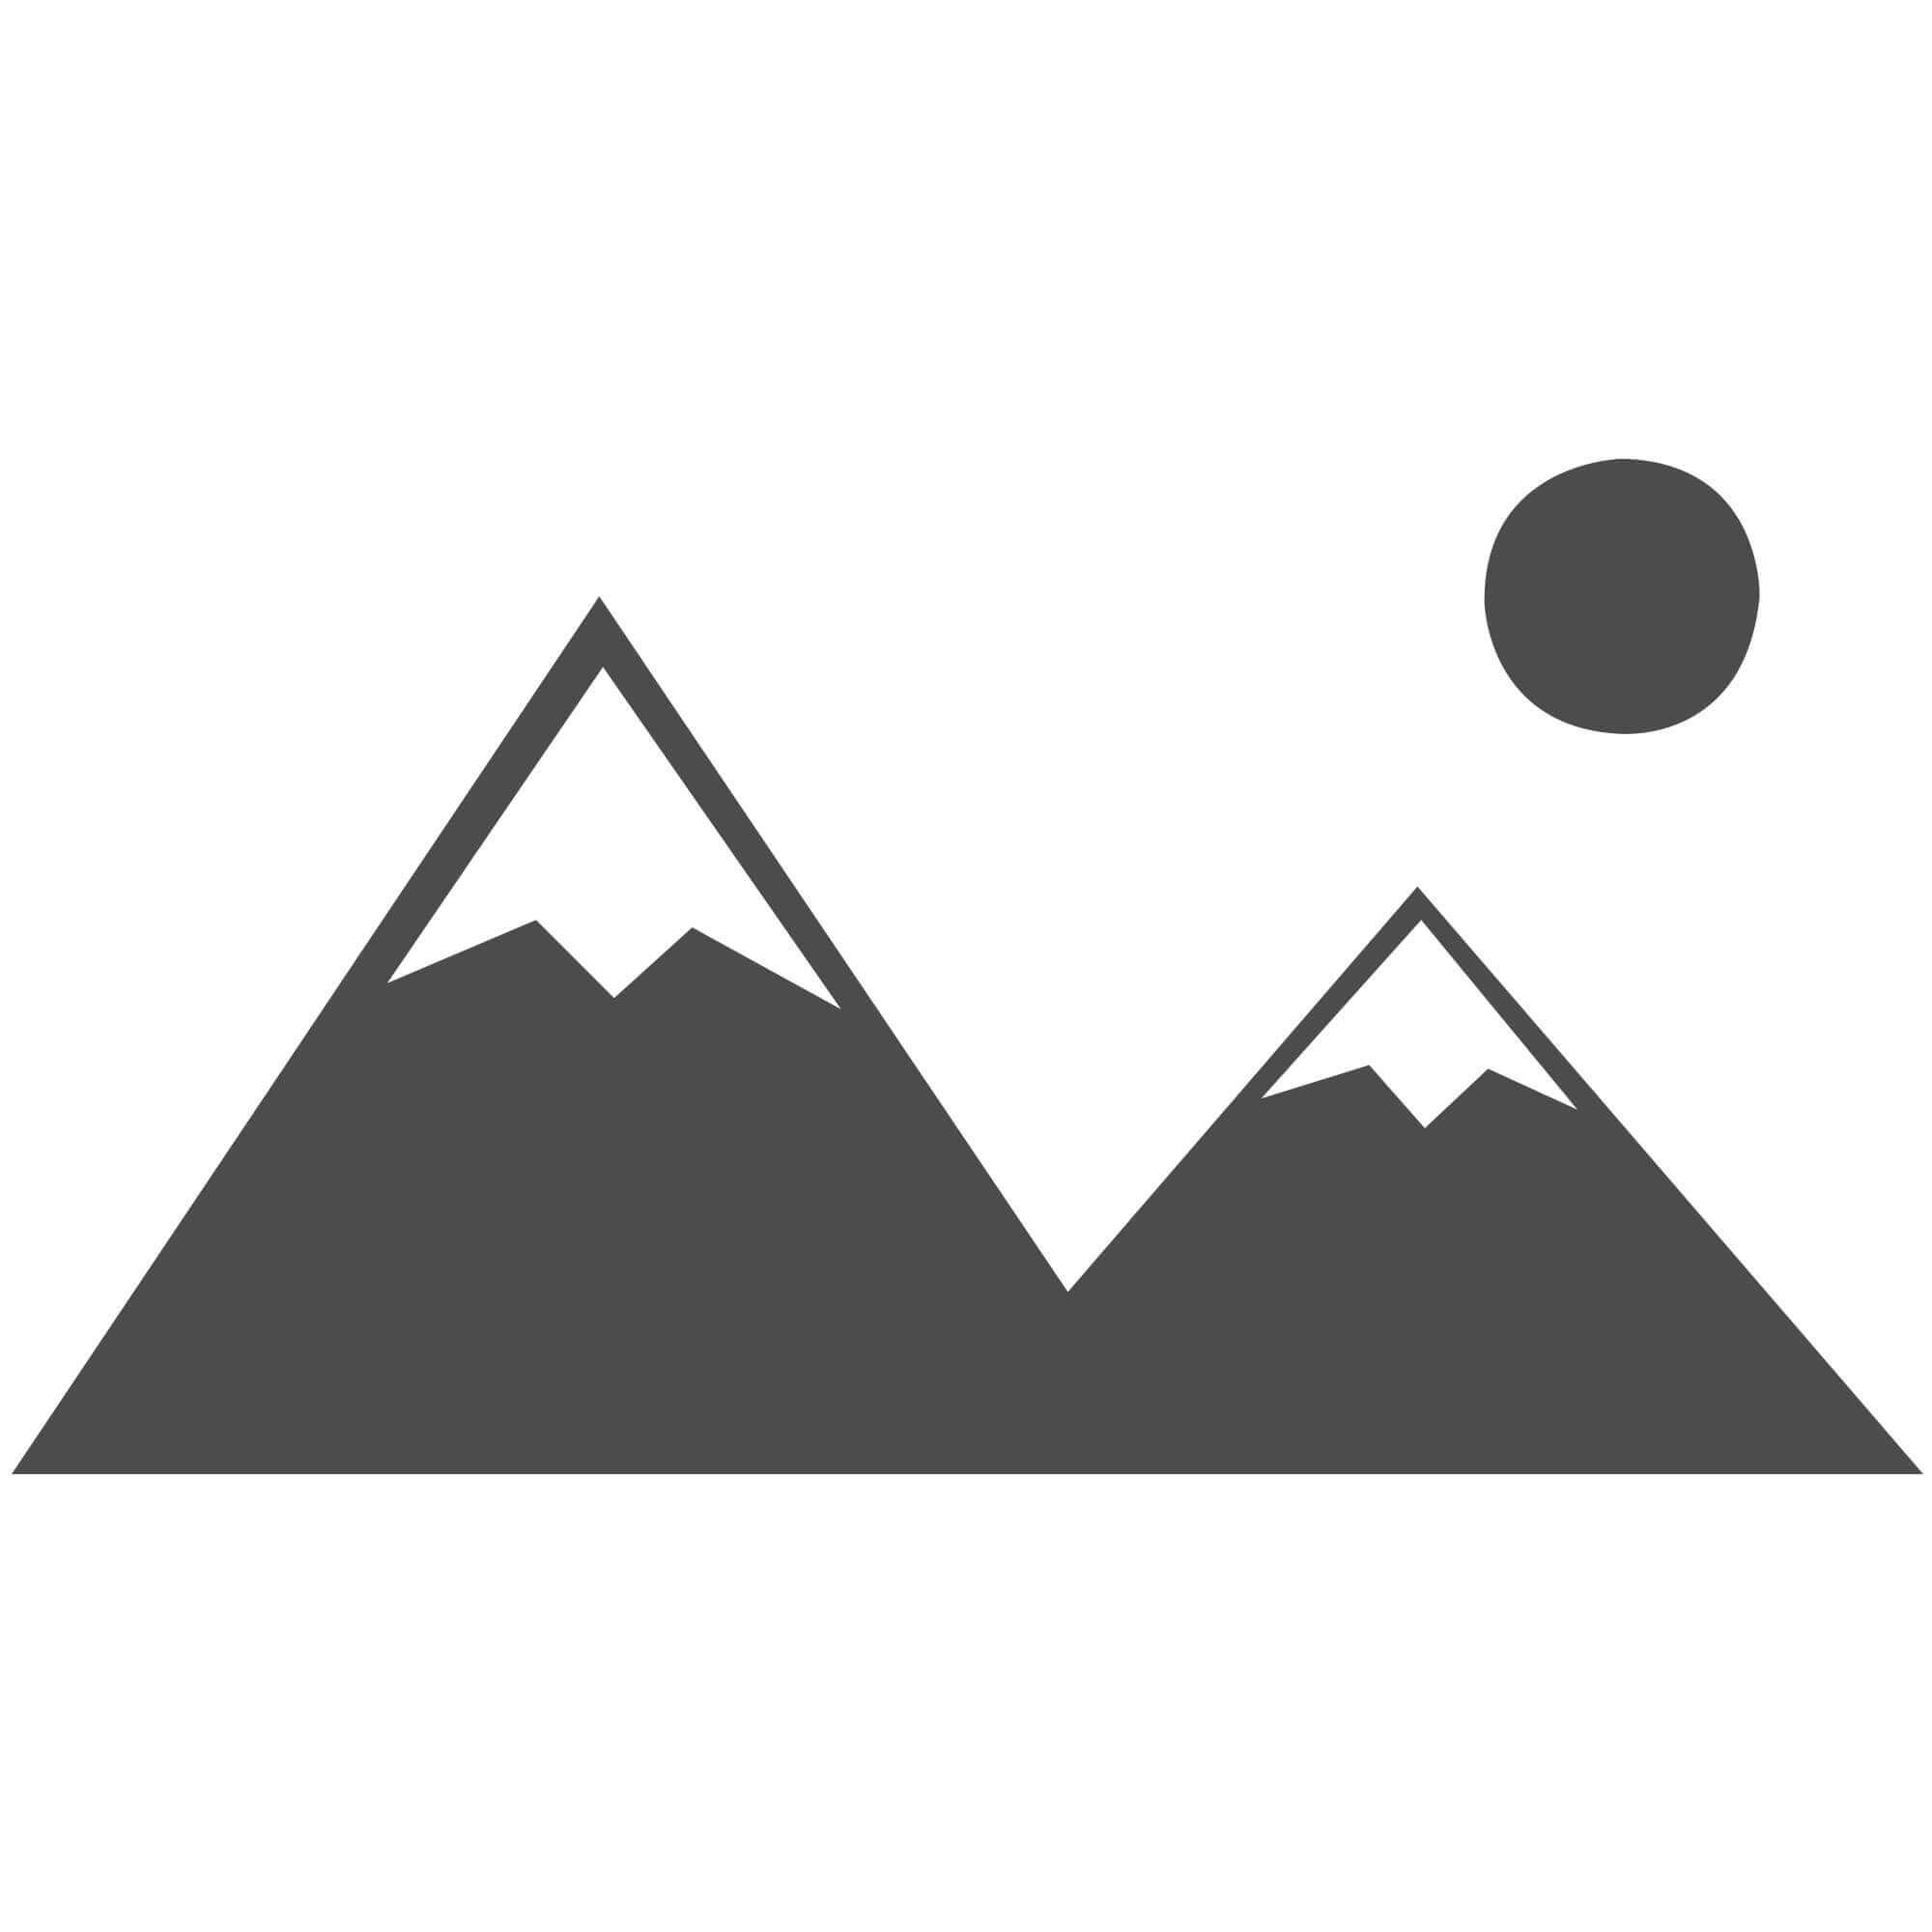 "Kashqai Traditional Persian Design Rug - 4308/300-135 x 200 cm (4'5"" x 6'7"")"